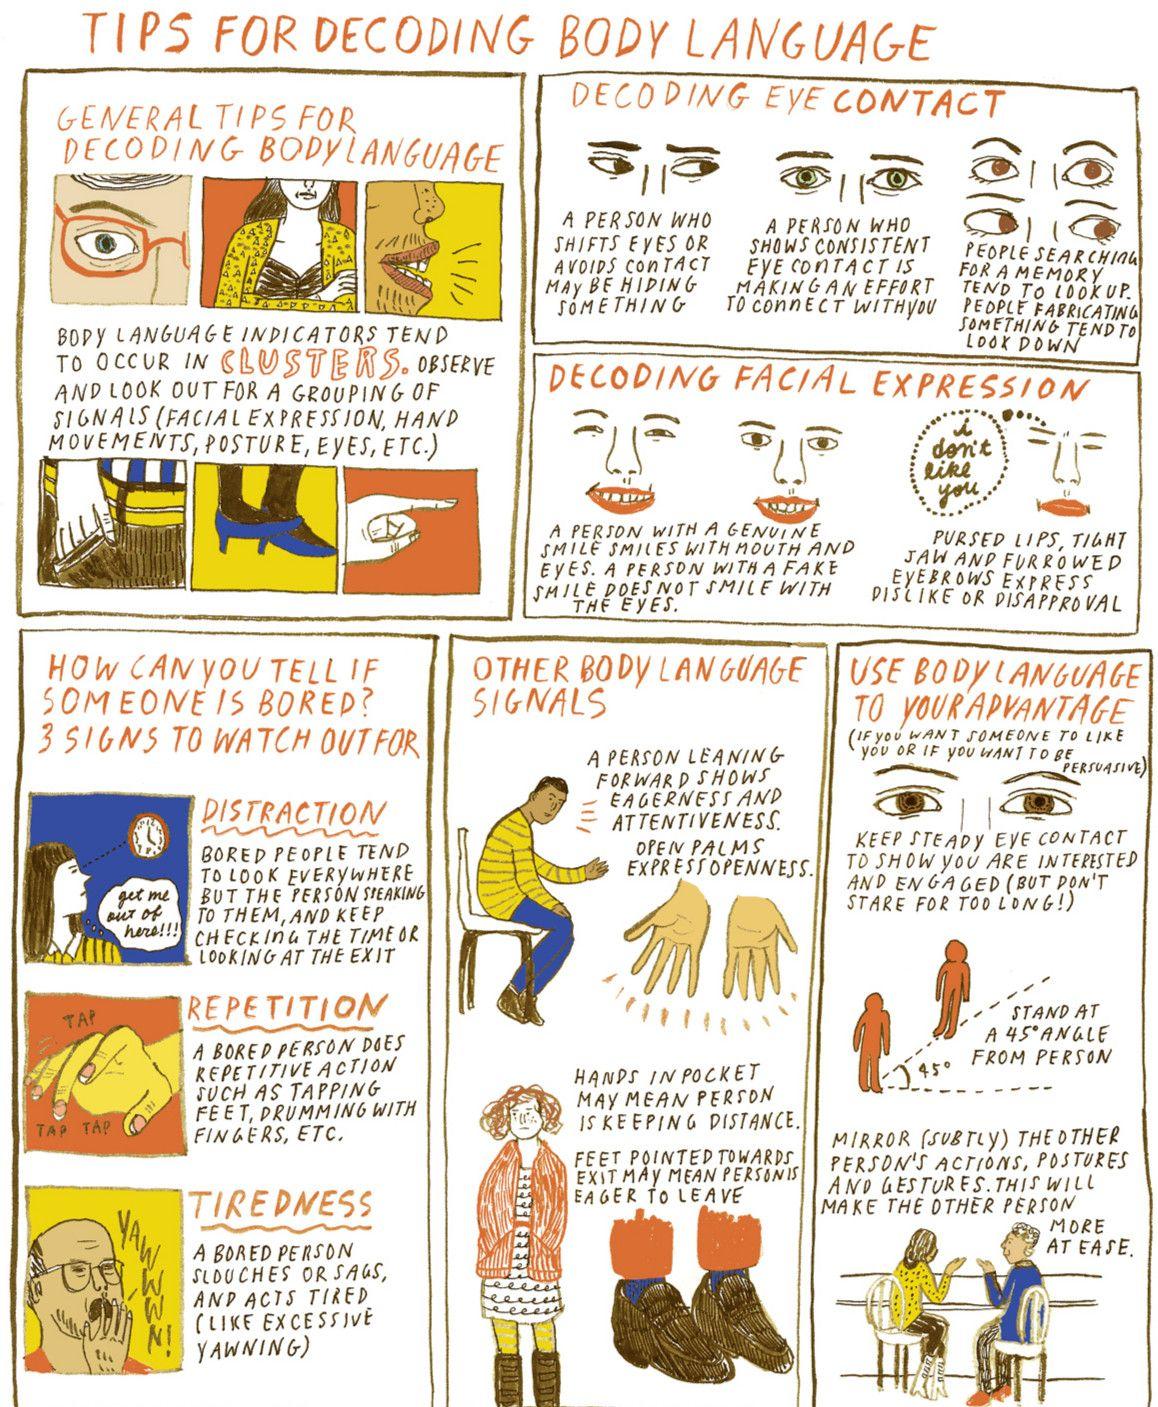 How to Decode Body Language..-  Como decodificar el Lenguaje Corporal... #Infografia #Infographic